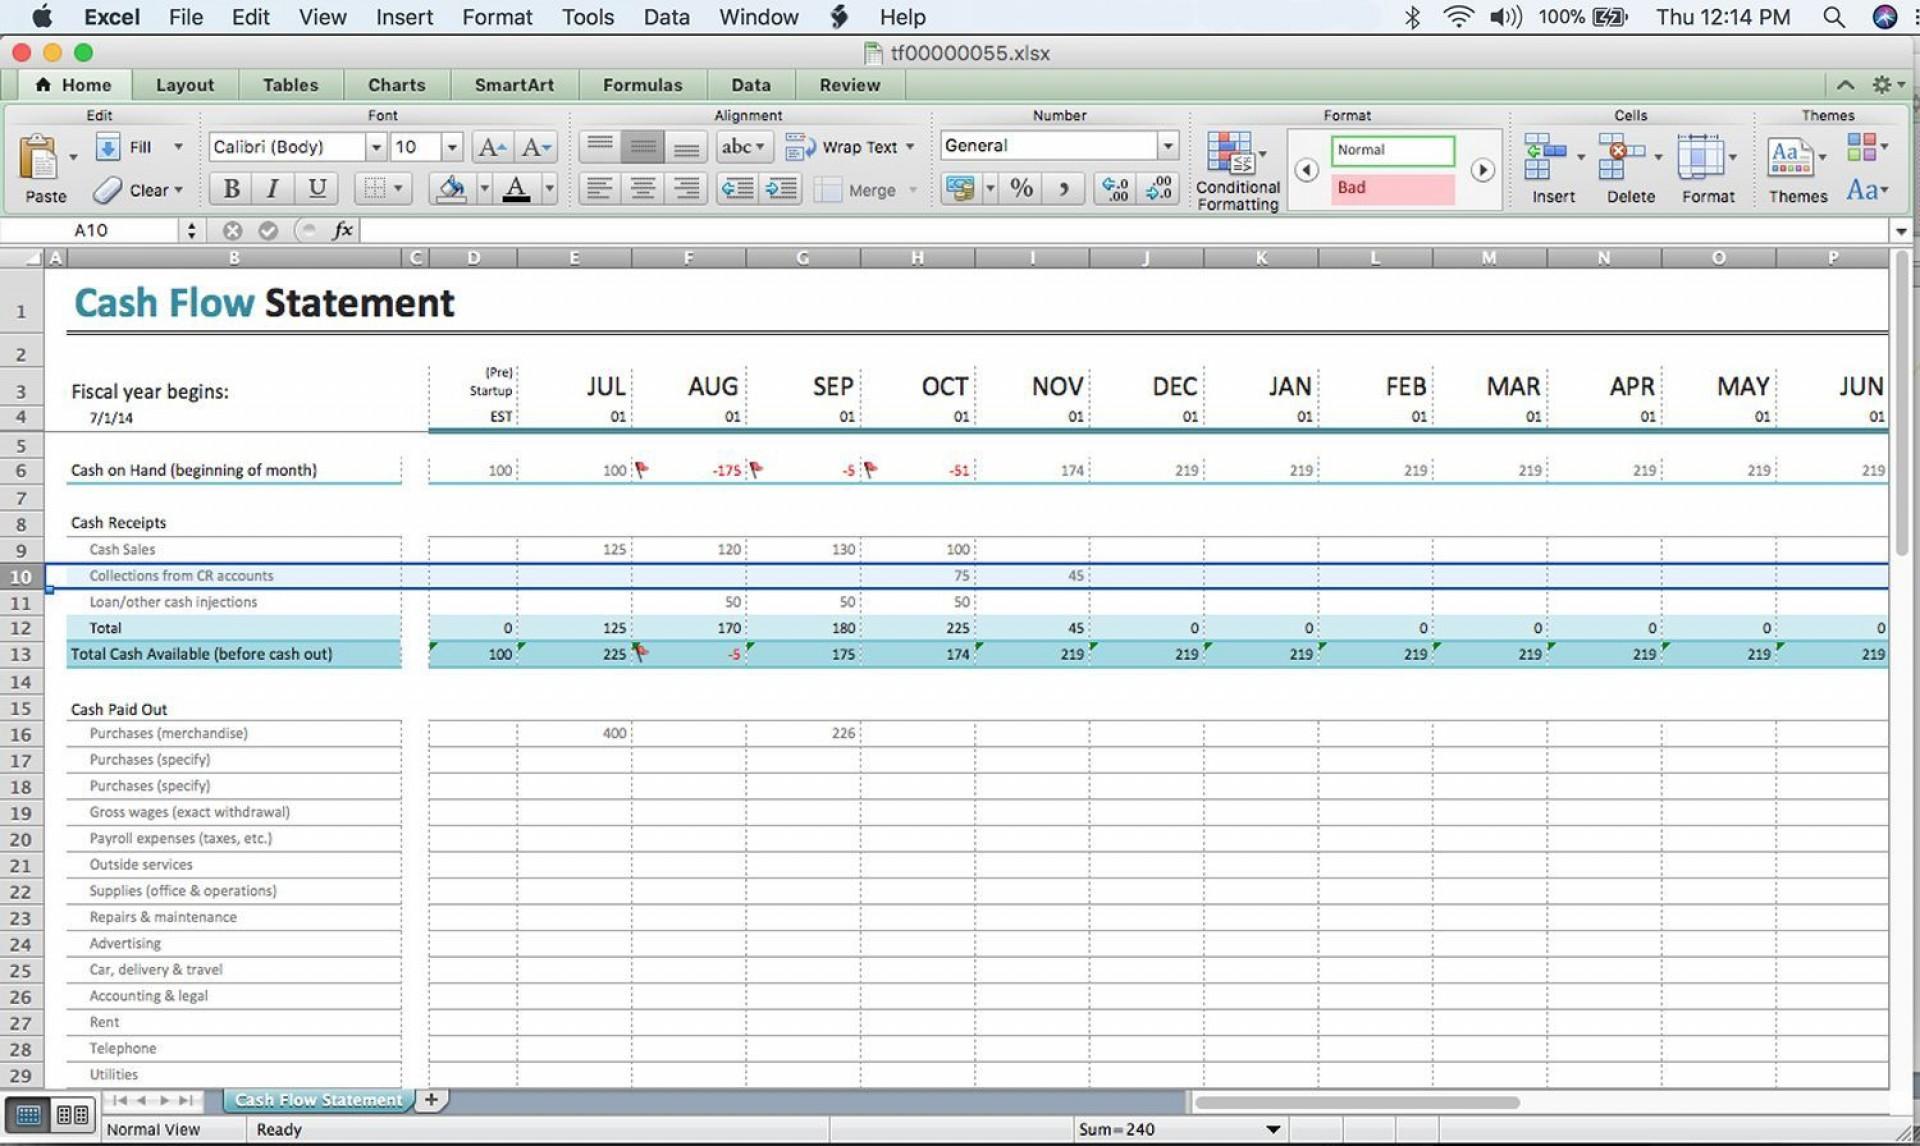 001 Best Cash Flow Template Excel Highest Quality  2007 Download1920